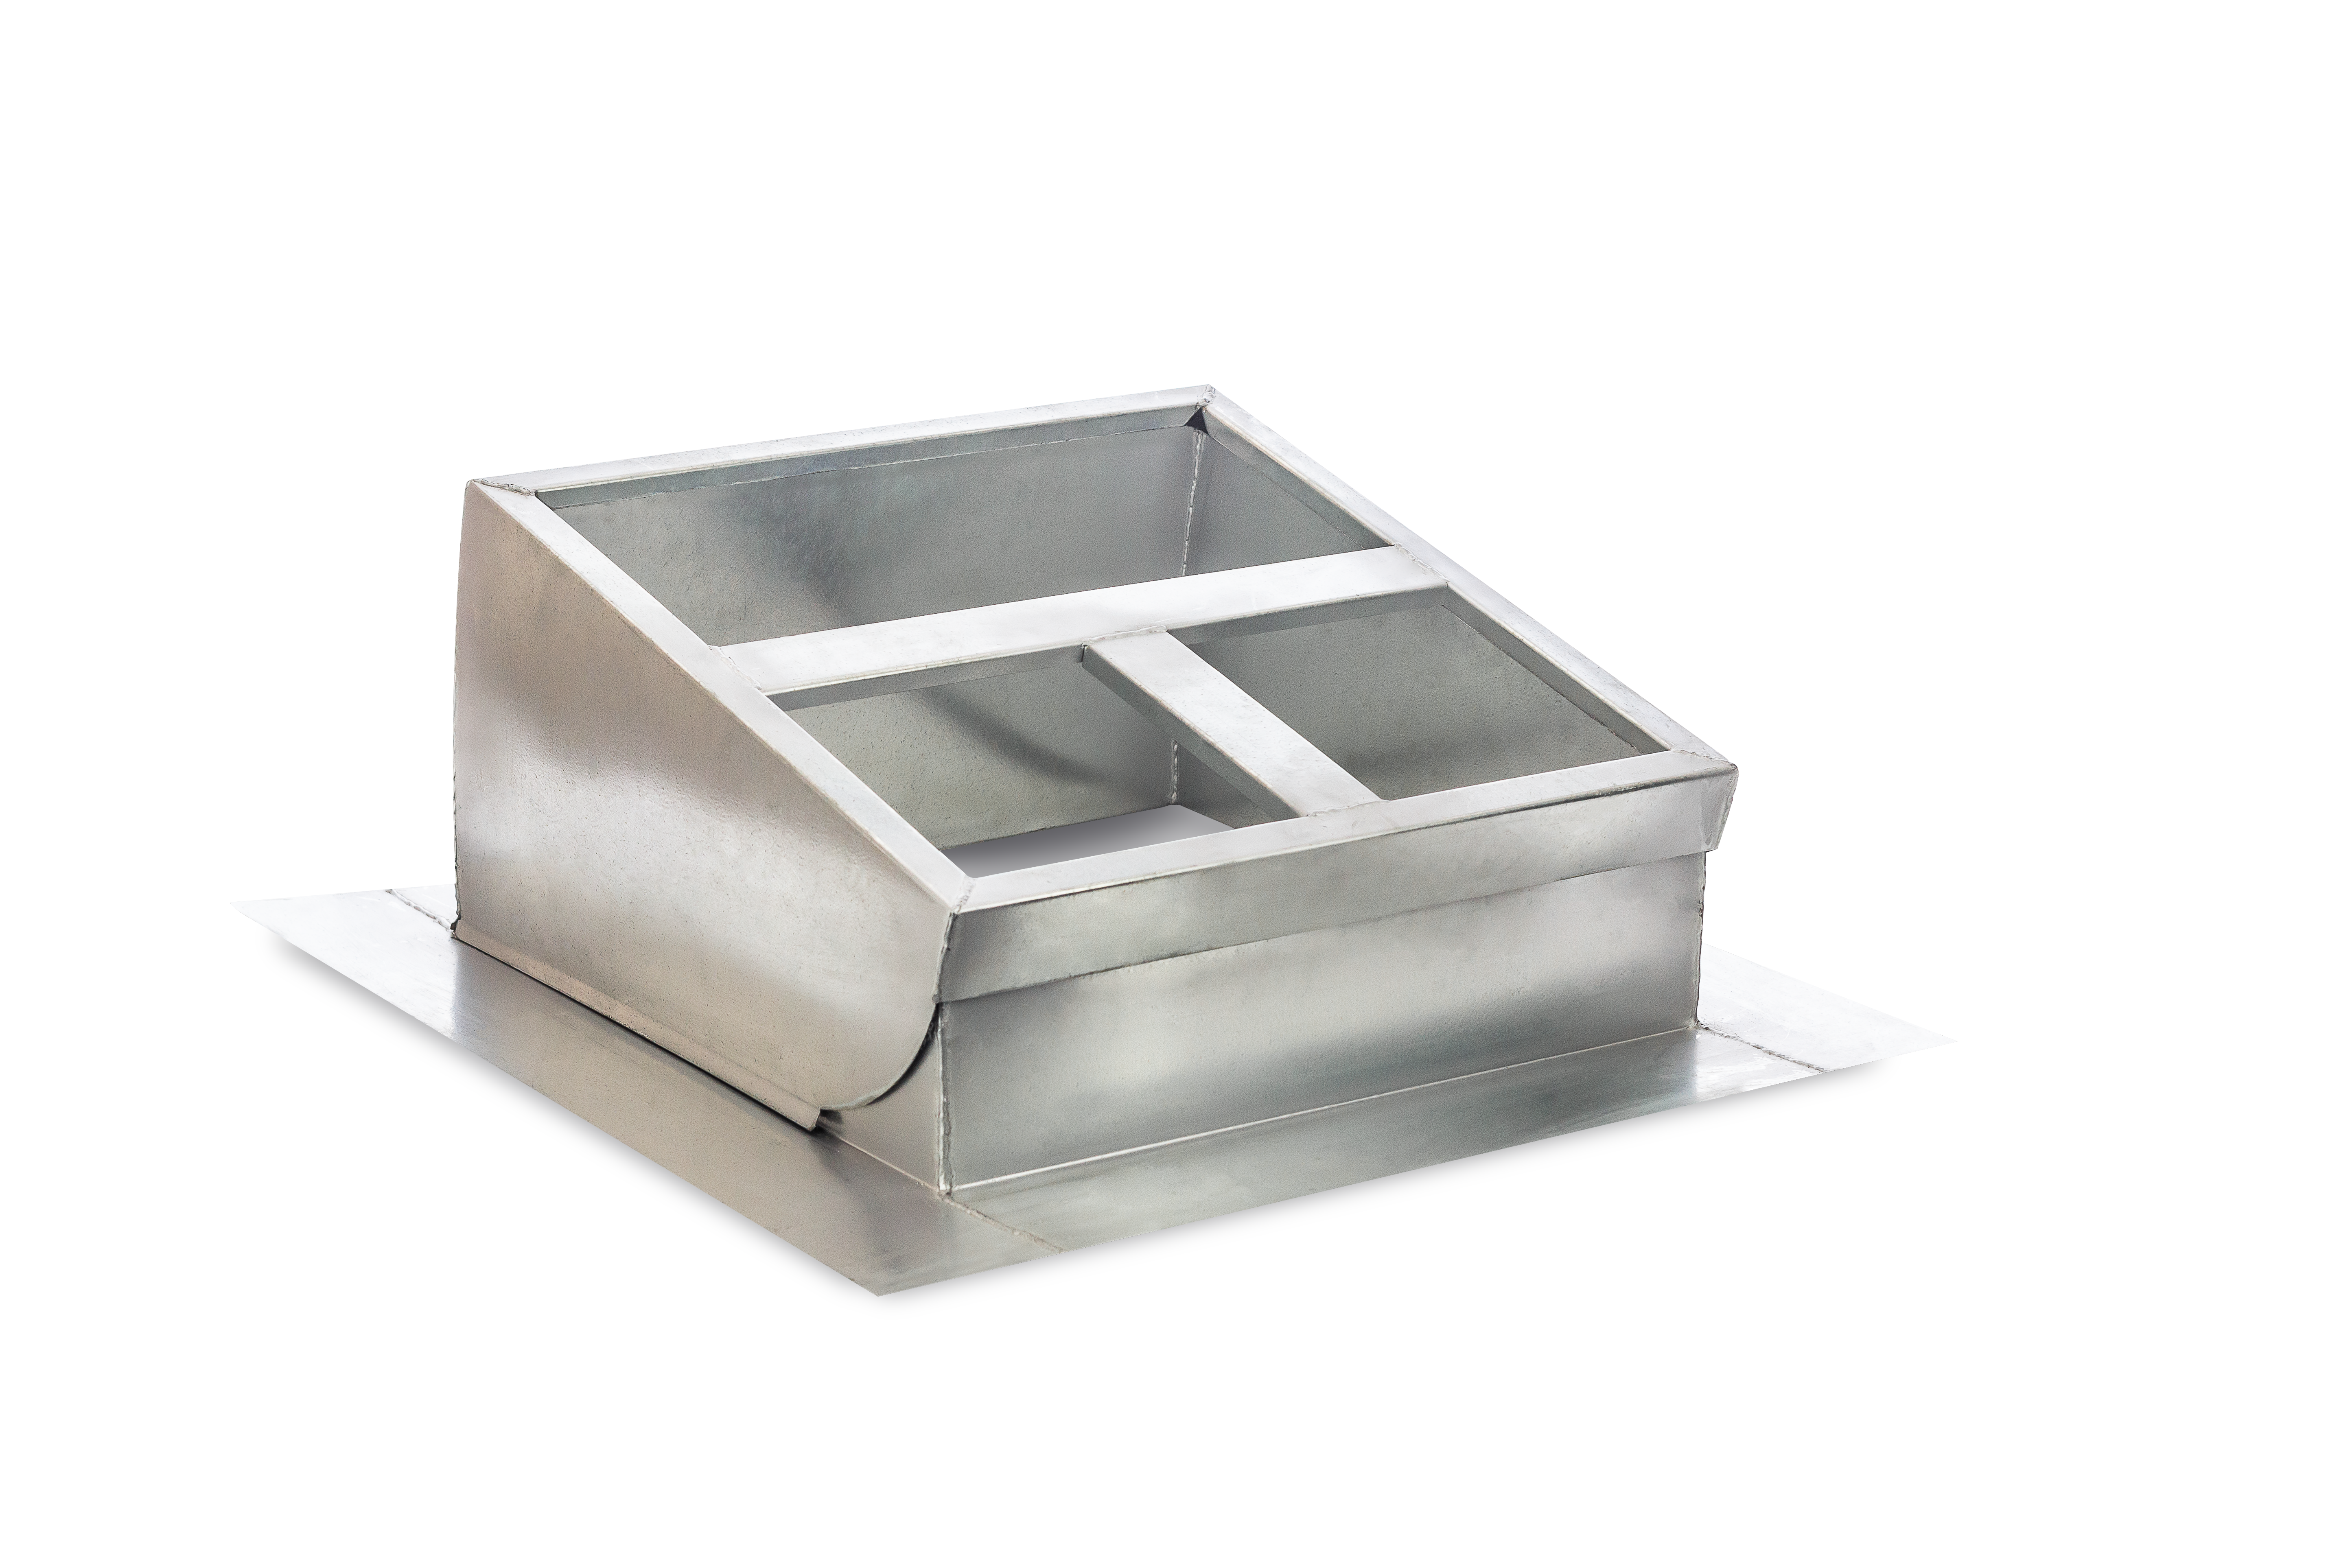 Adjustable Curb Sheet metal